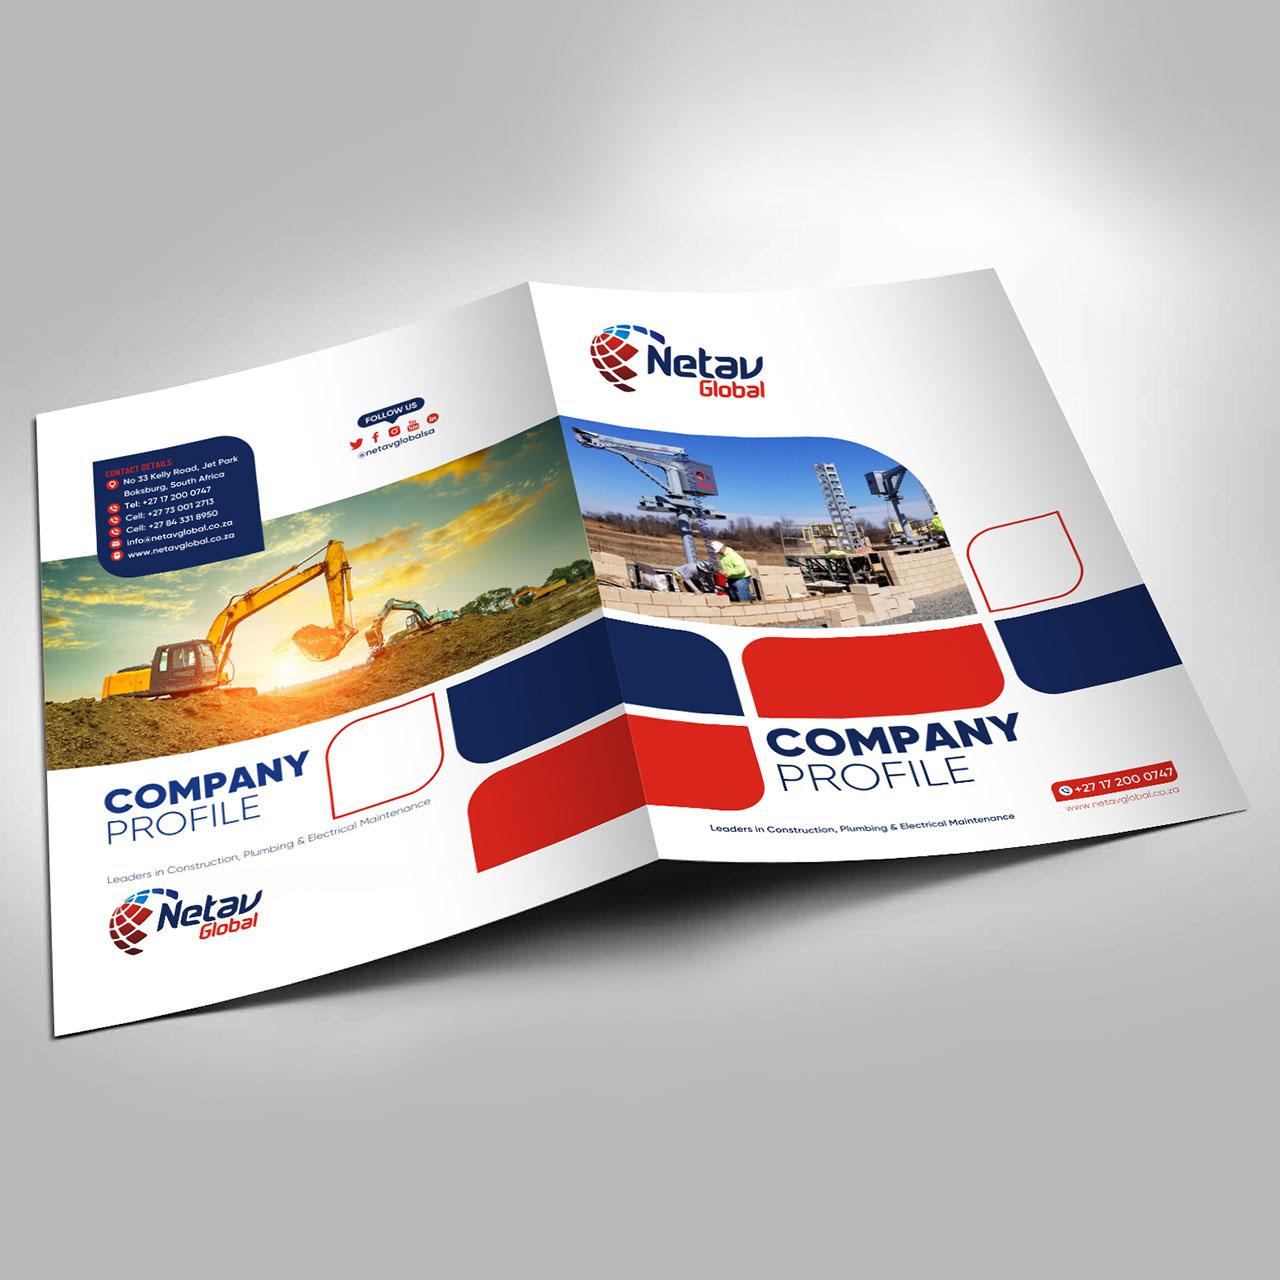 Netav Global Company Profile